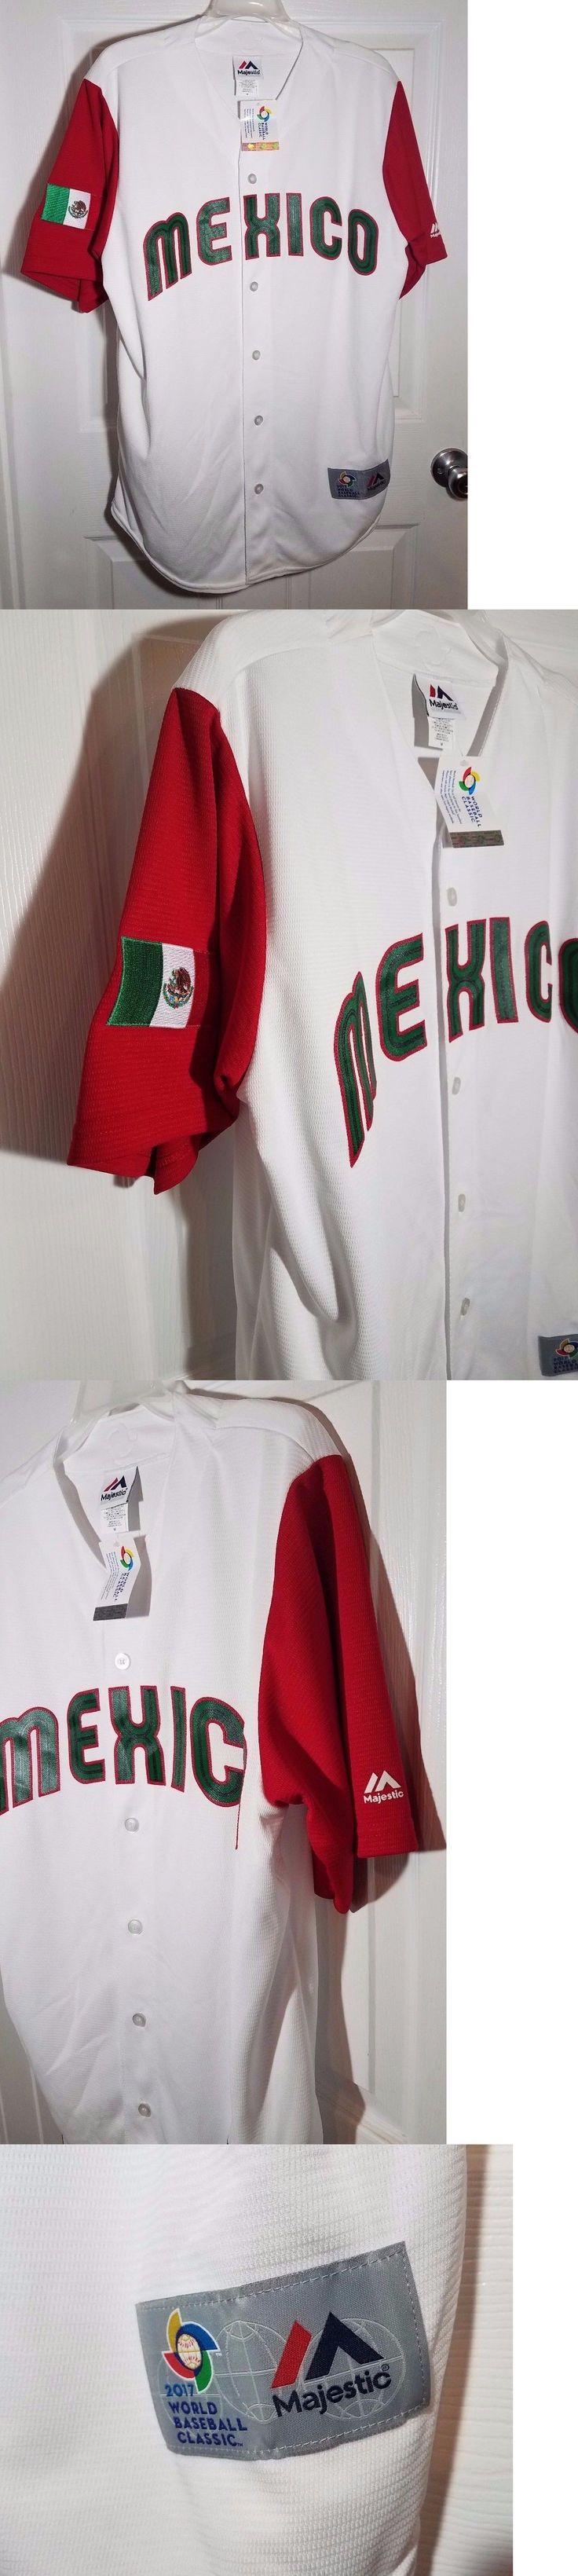 Baseball-Other 204: Majestic Wbc Mexico 2017 World Baseball Classic Home Jersey Men S Sz Medium New -> BUY IT NOW ONLY: $60 on eBay!